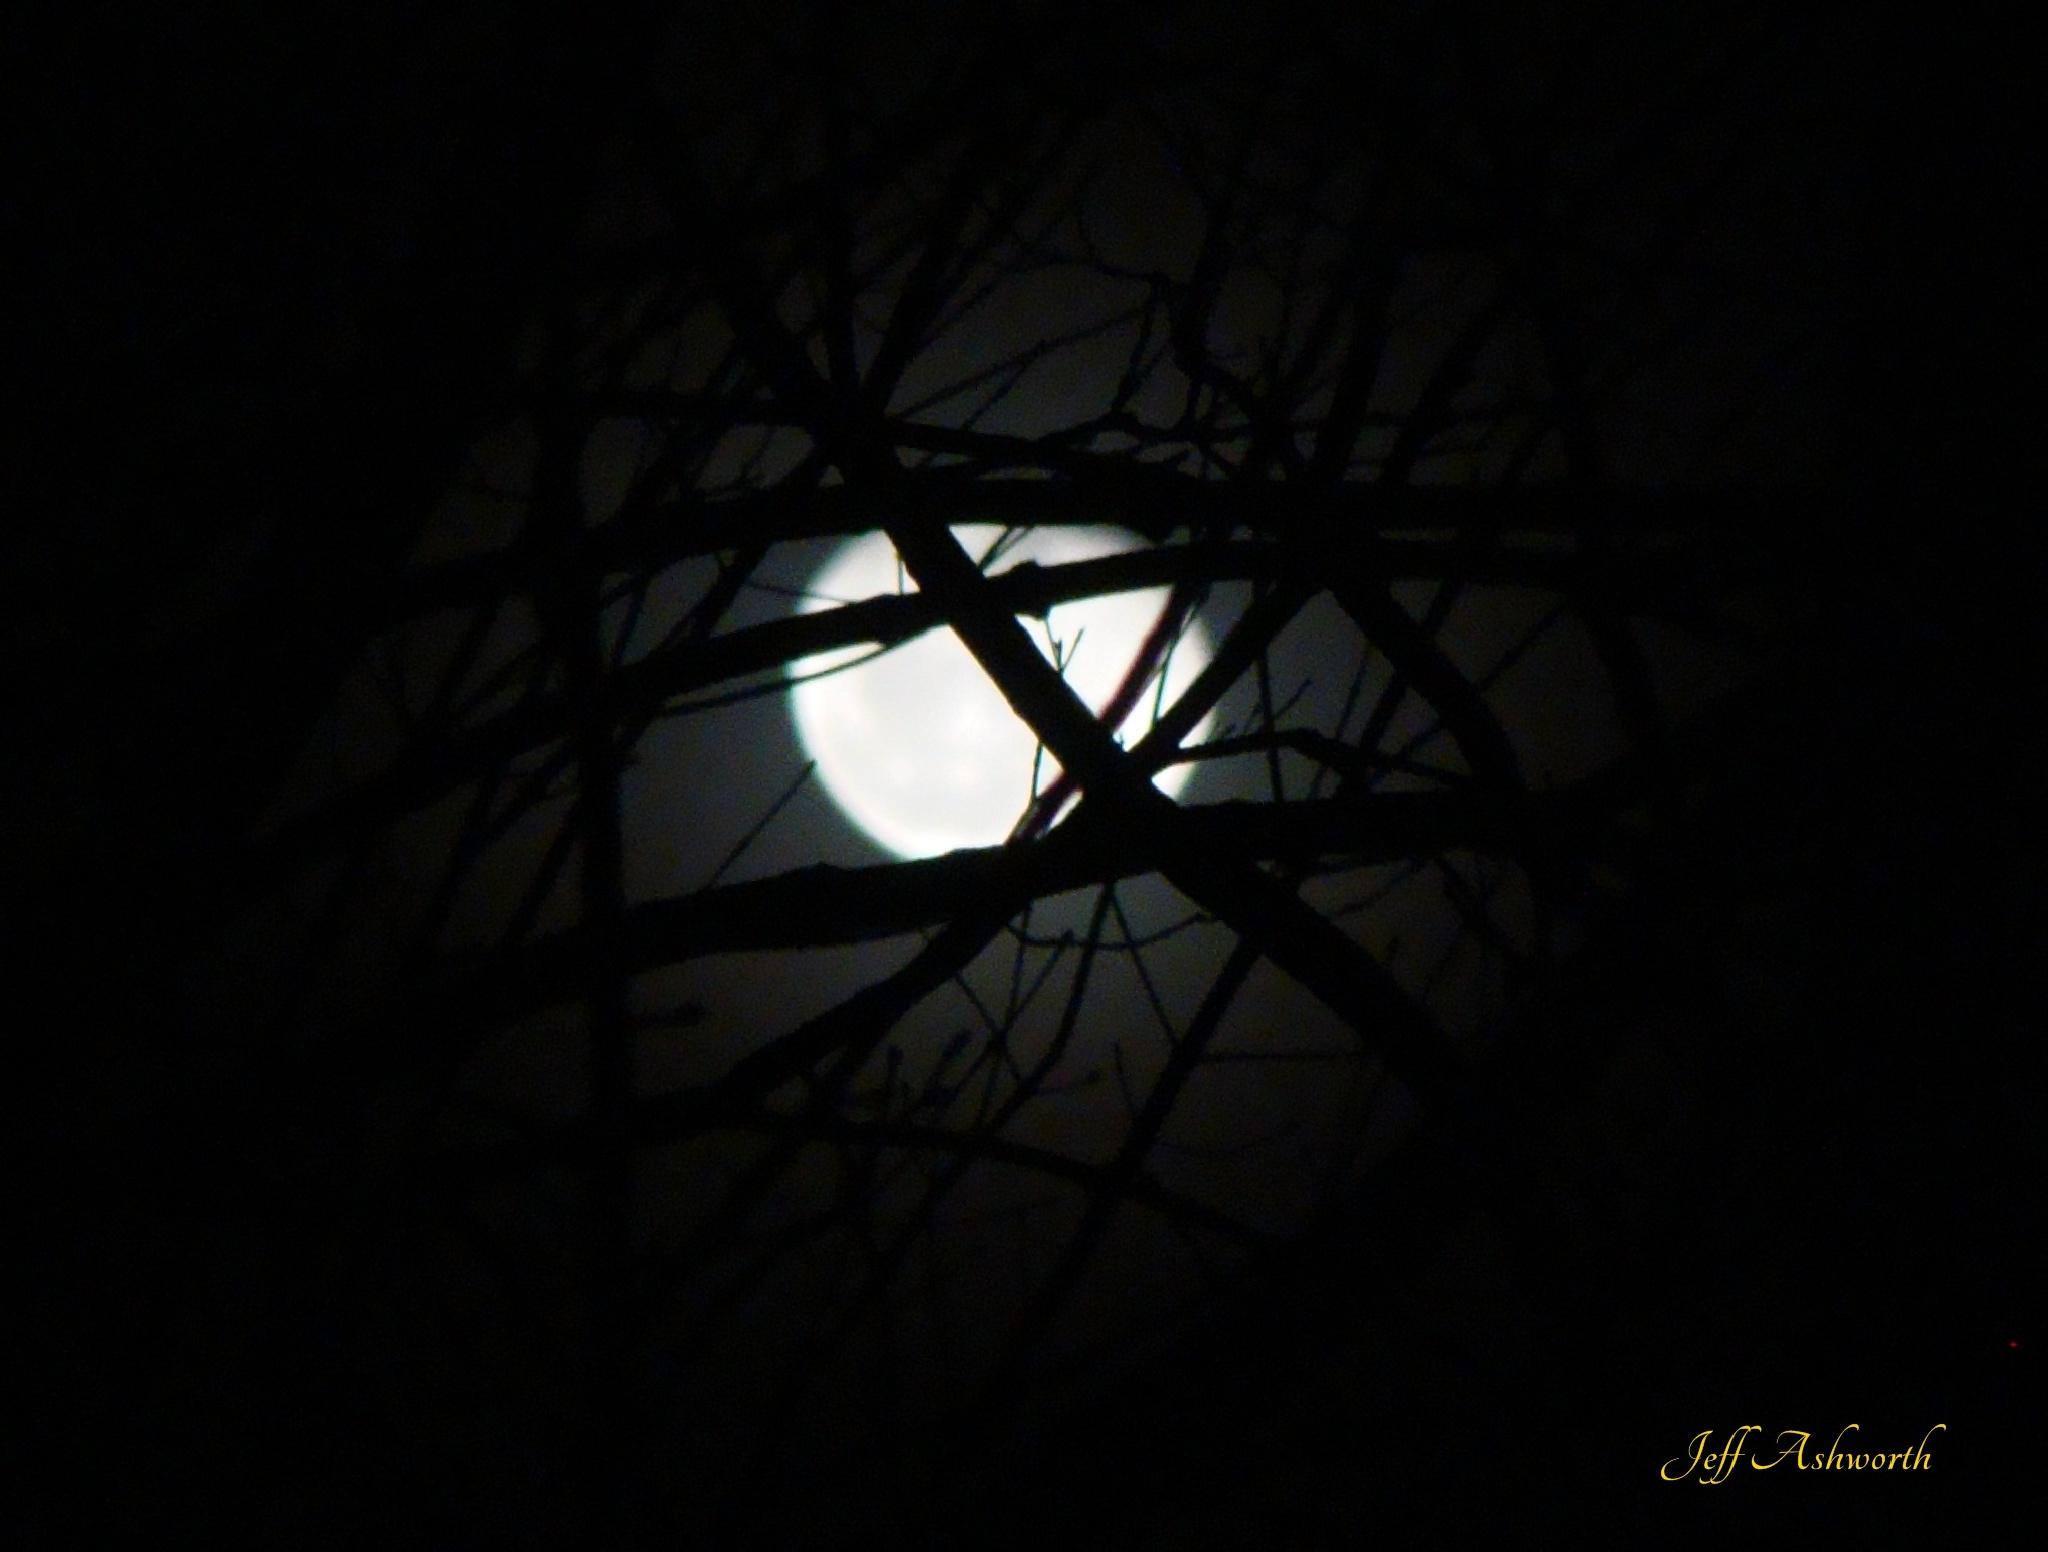 December Moon by jeffashworth